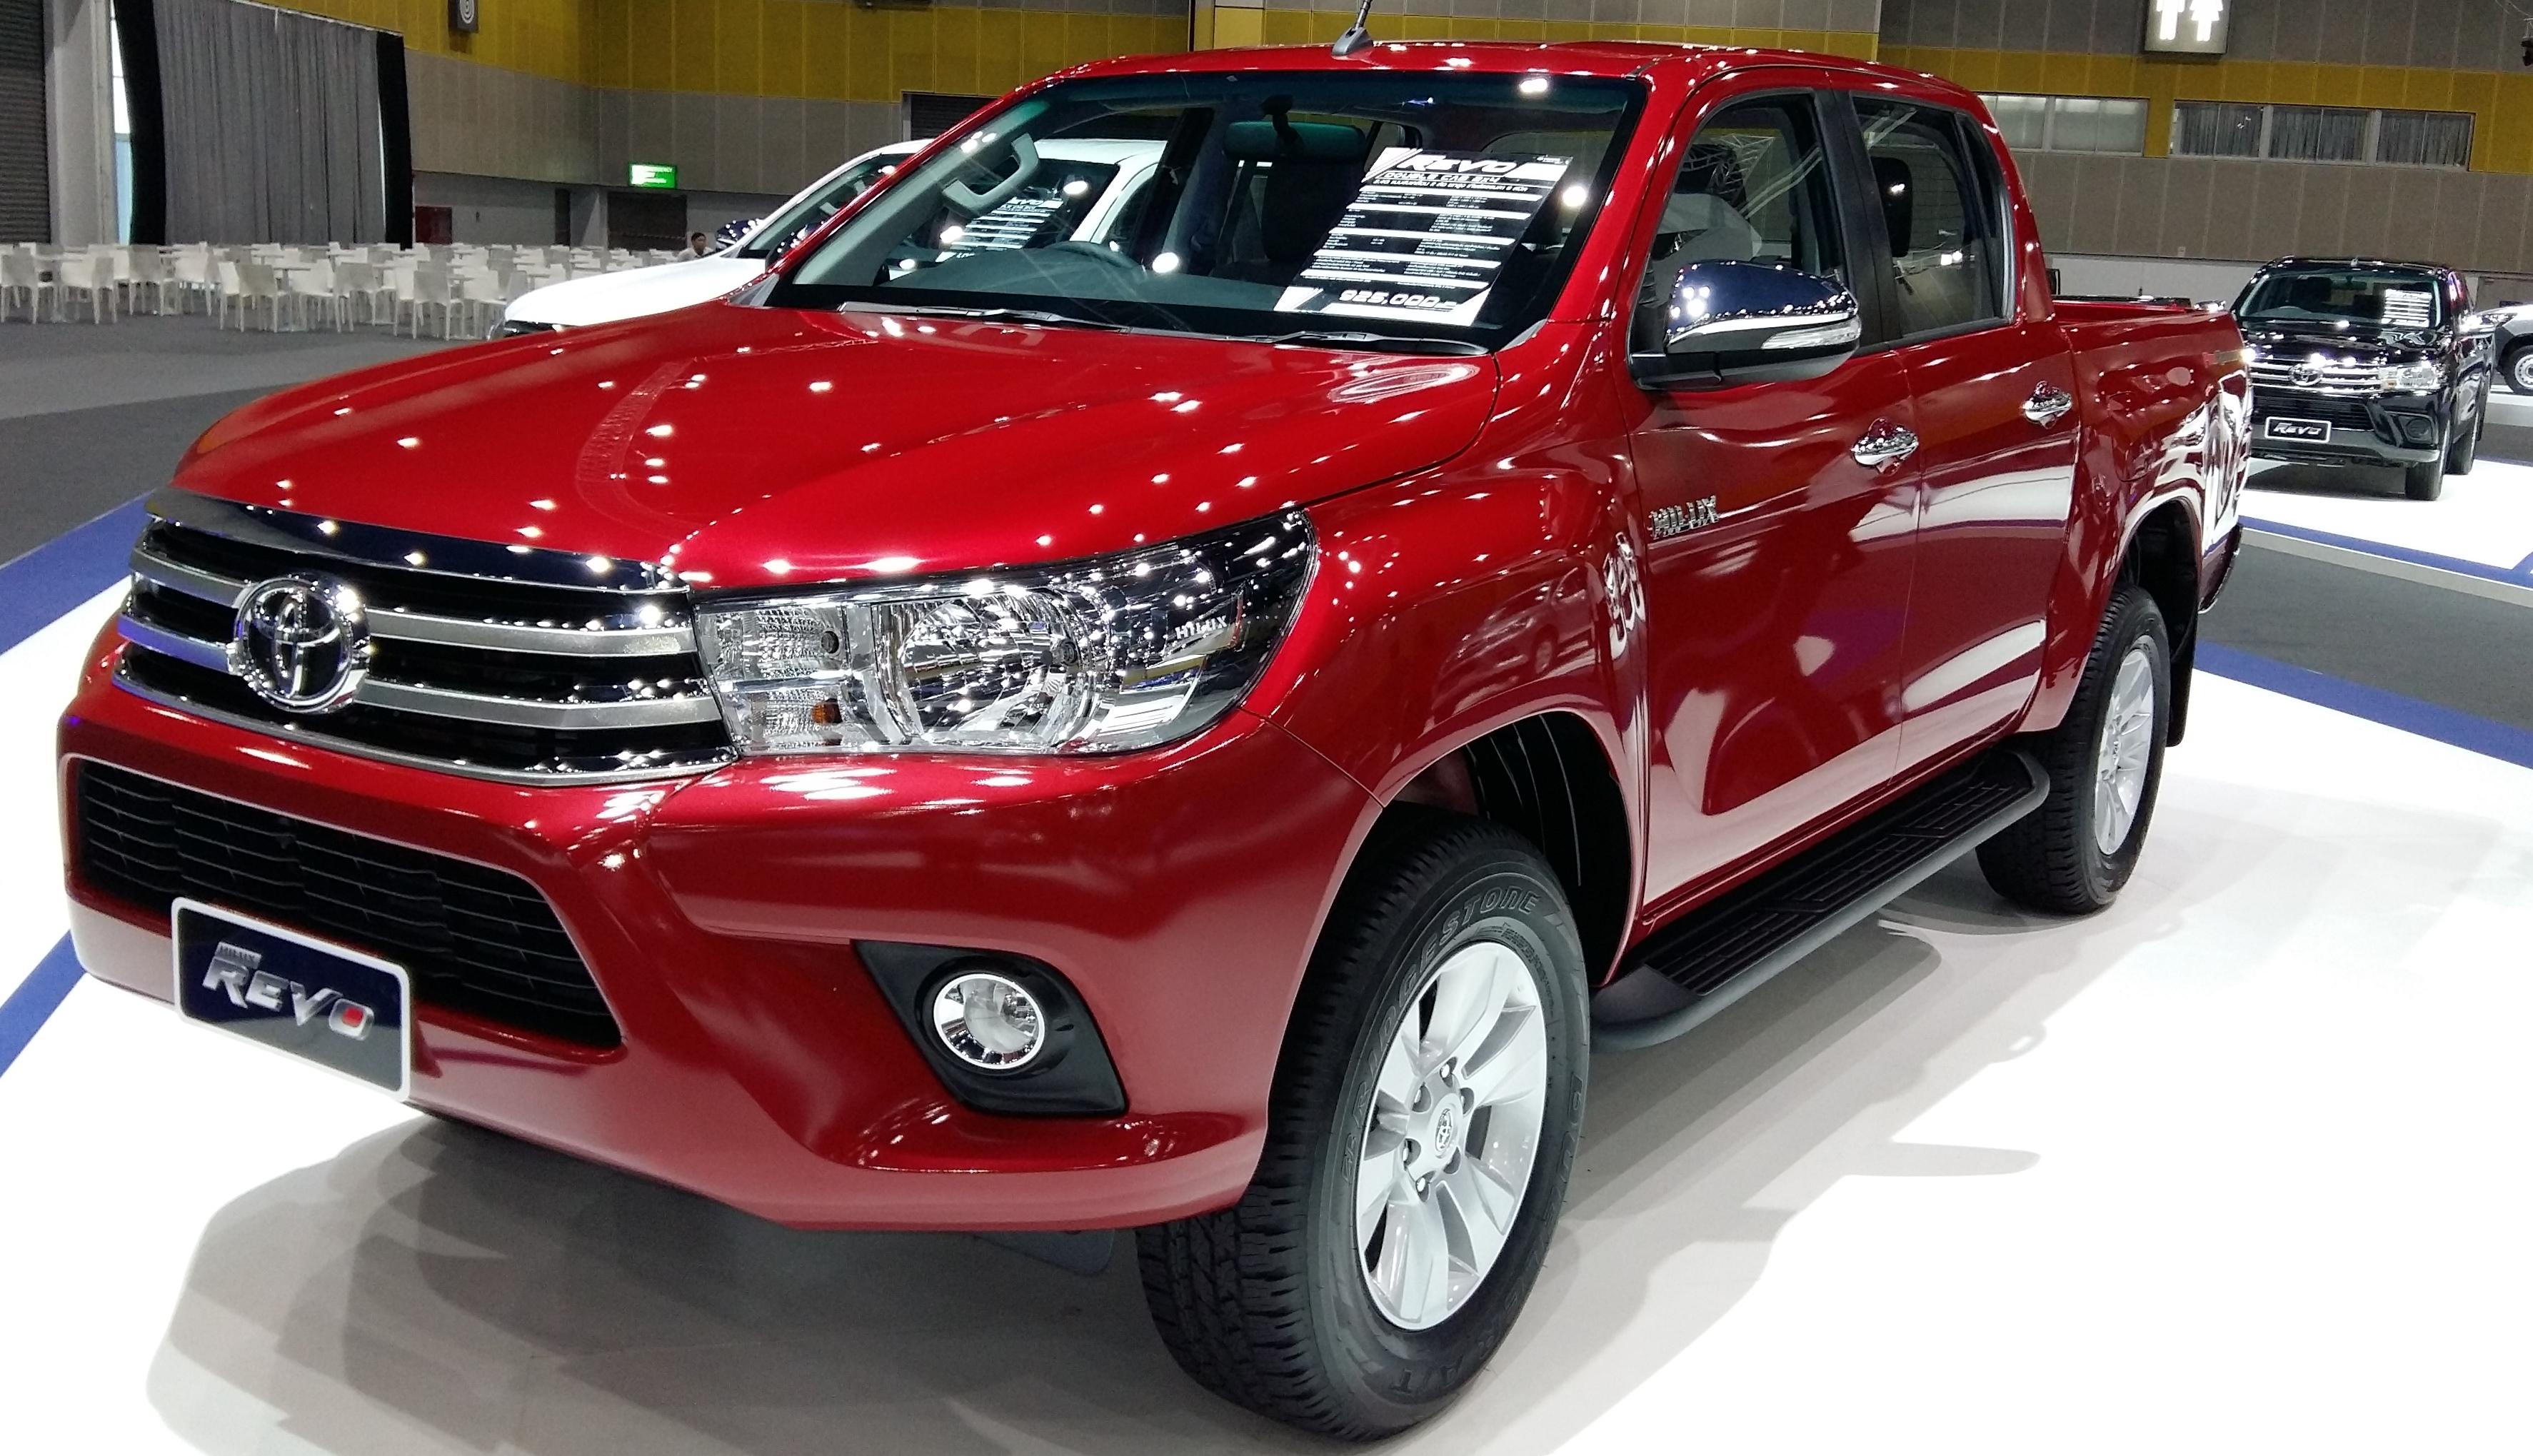 Toyota Hilux Revo Red Show